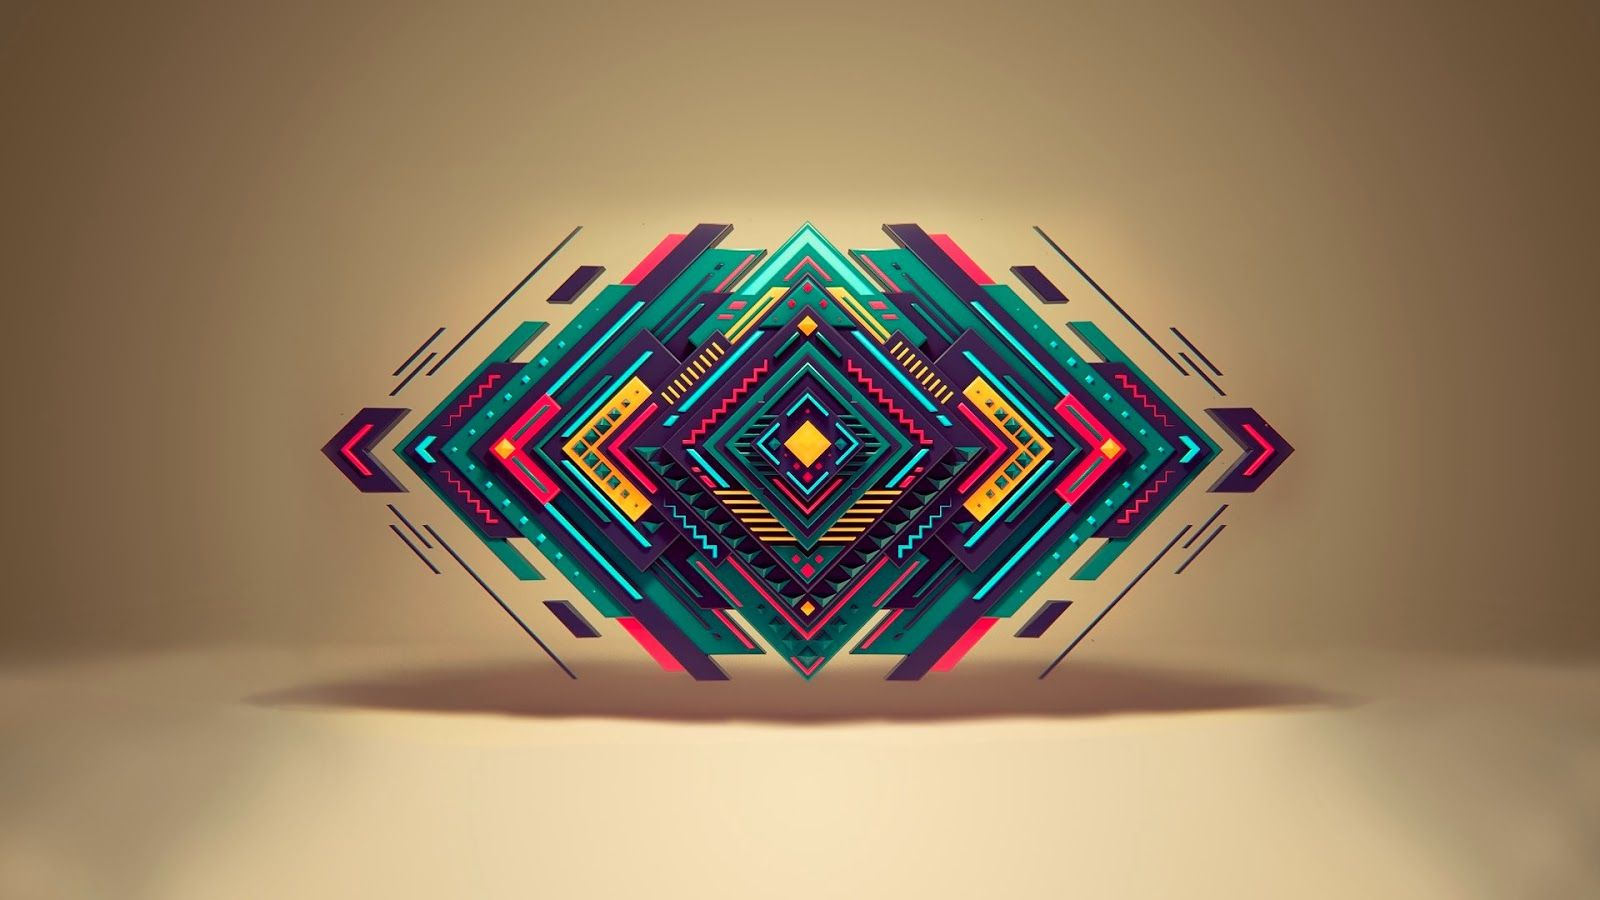 Wallpapers Full Hd Fondo Geometrico Papel Tapiz Abstracto Fondos De Pantalla Hd